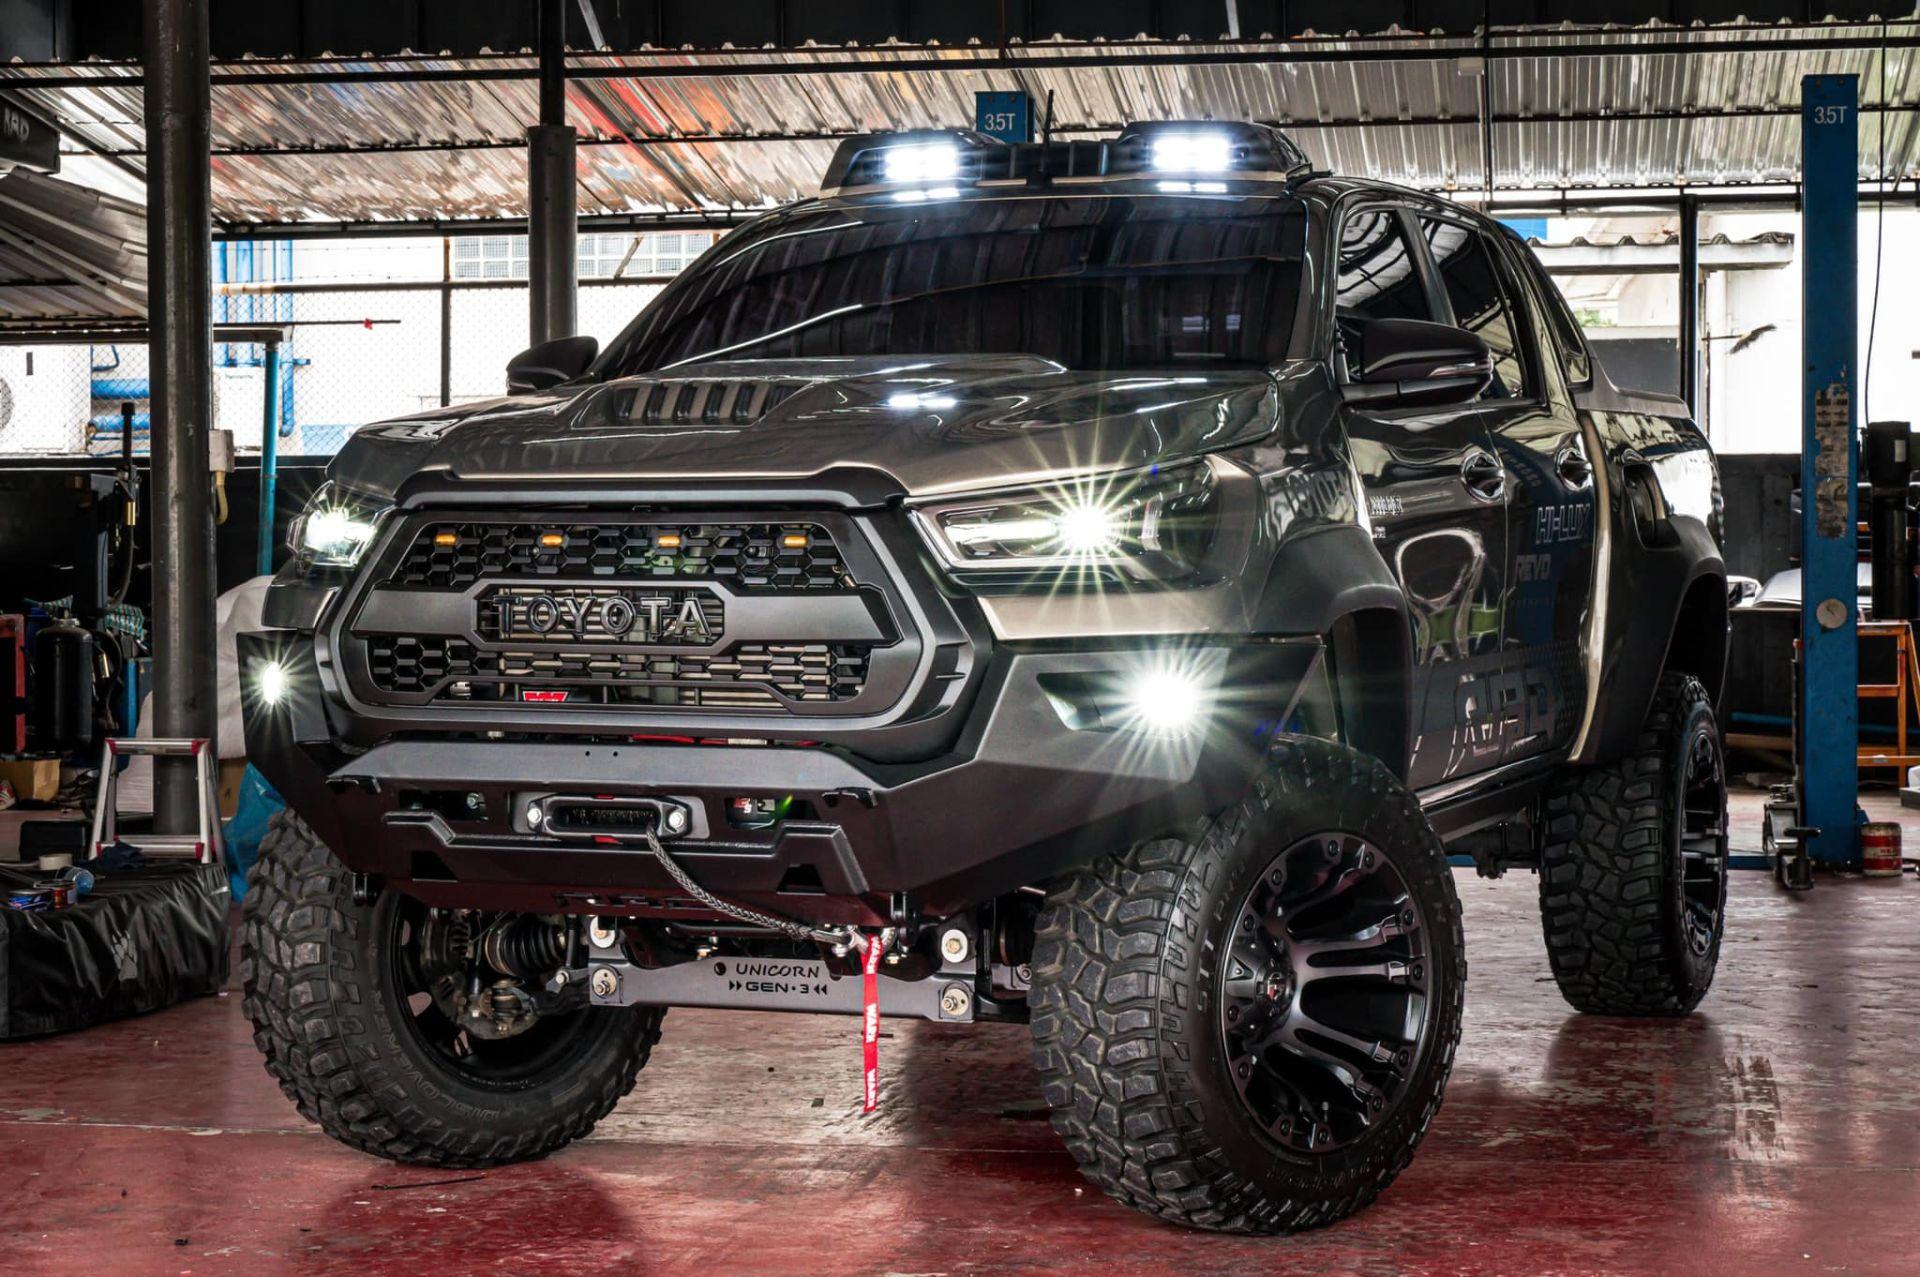 Toyota-Hilux-Pathfinder-by-RAD-13